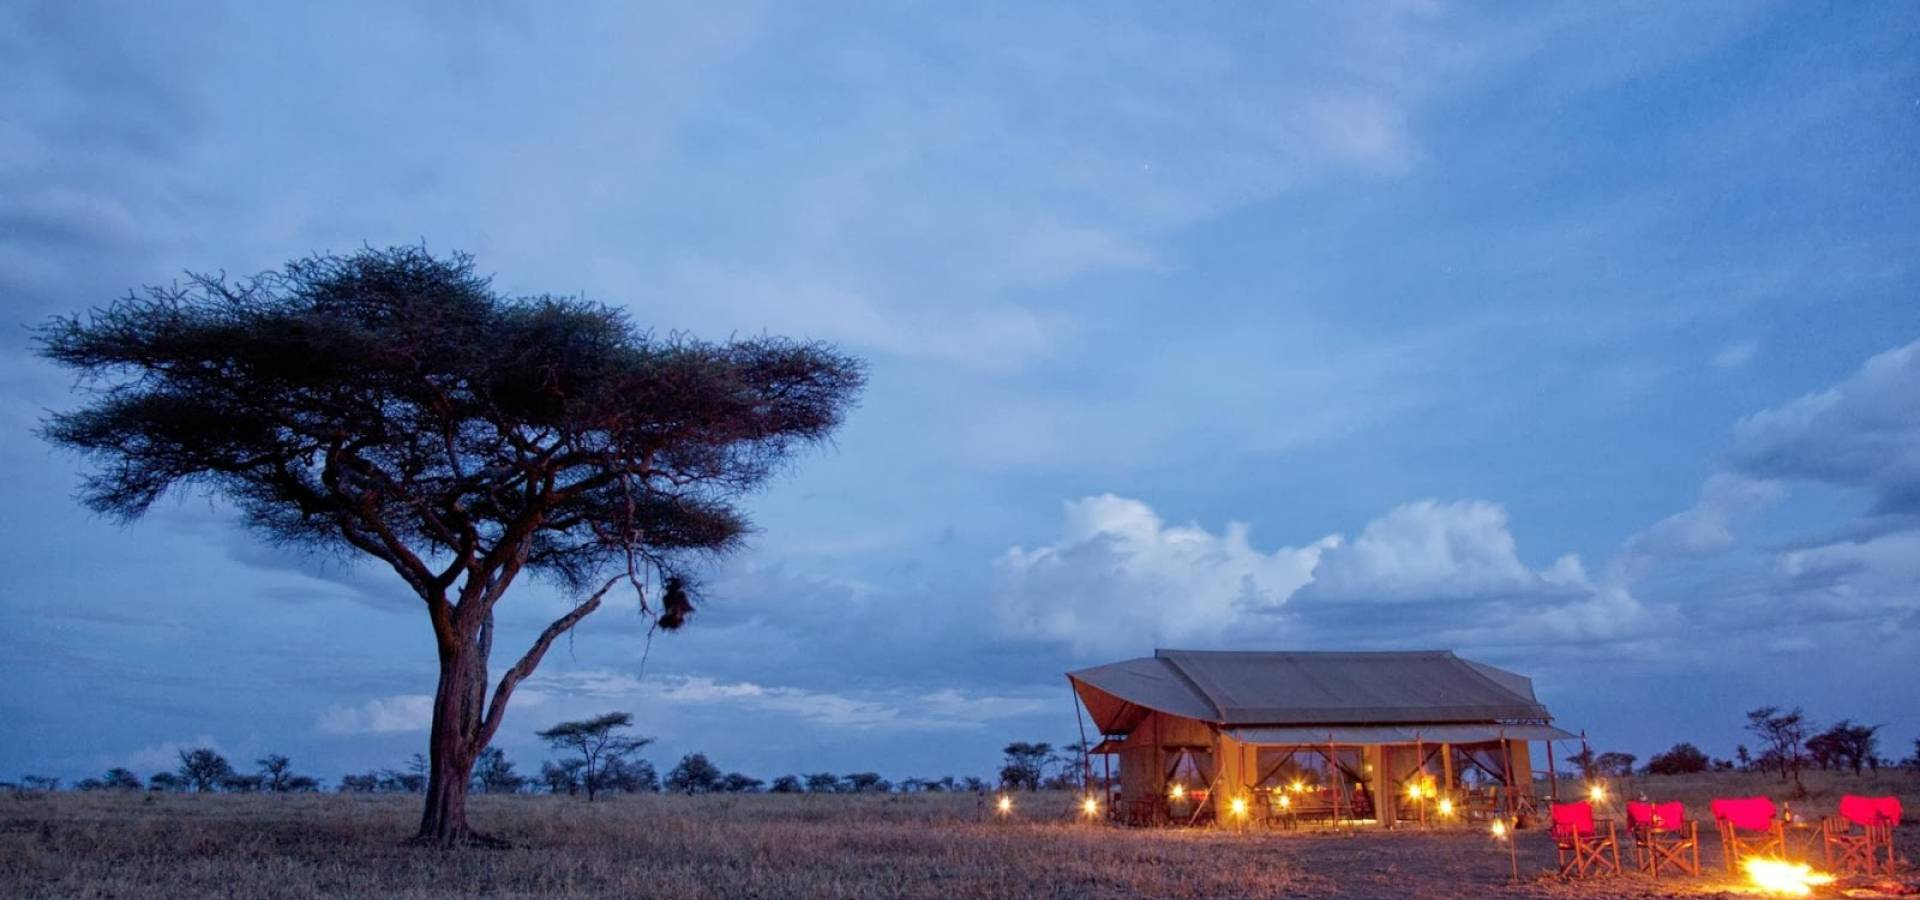 Safari-Vintage: Grand Tanganika al Completo en 4x4